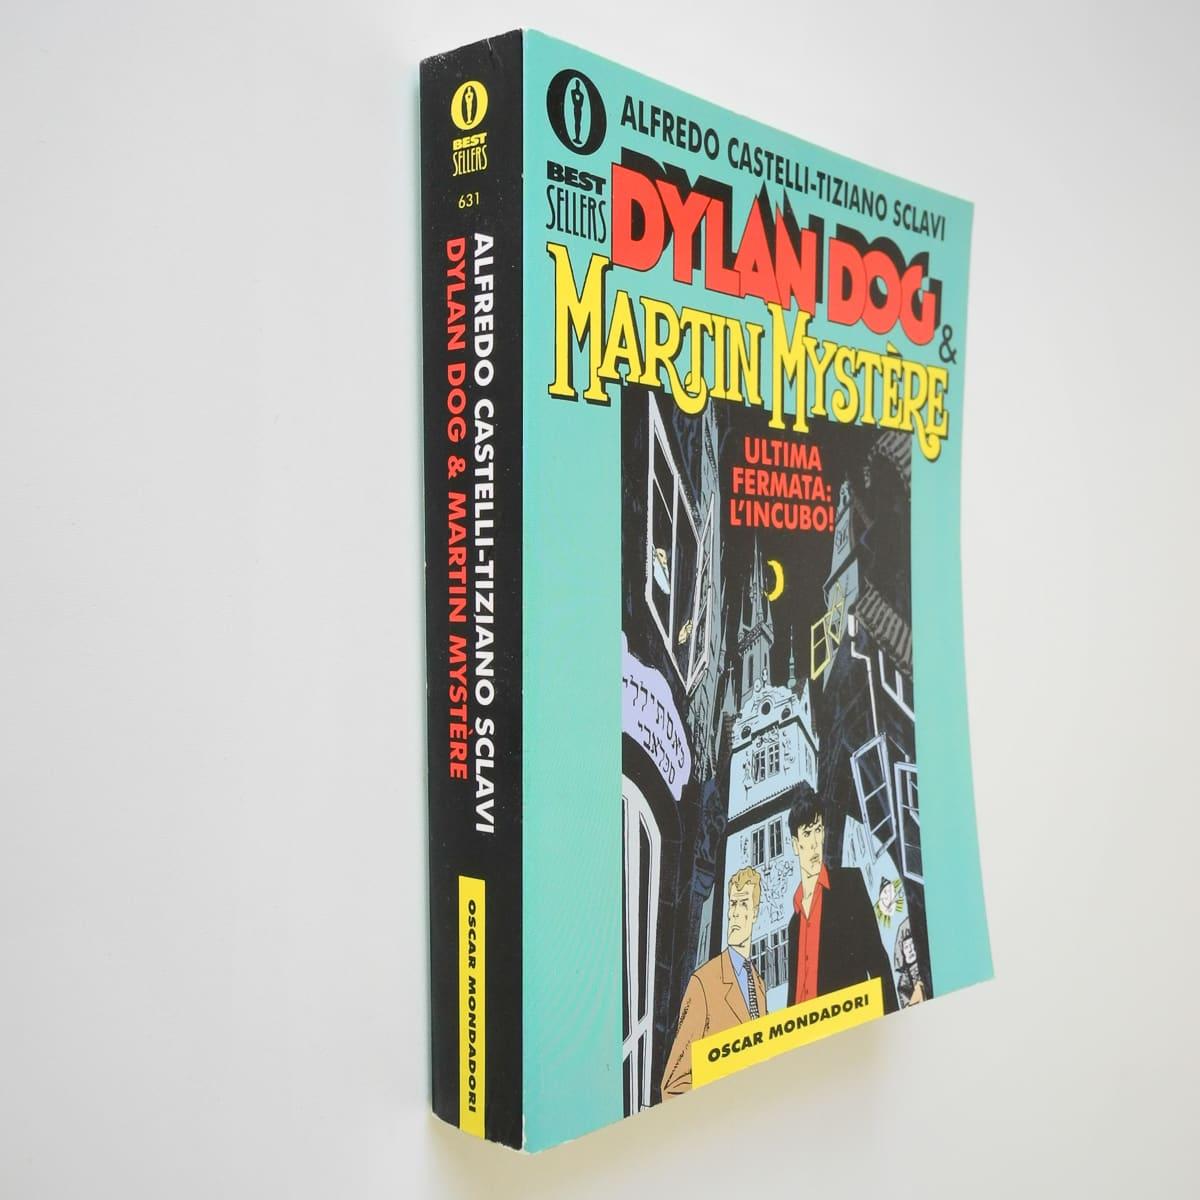 Dylan Dog & Martin Mystere Oscar Mondadori